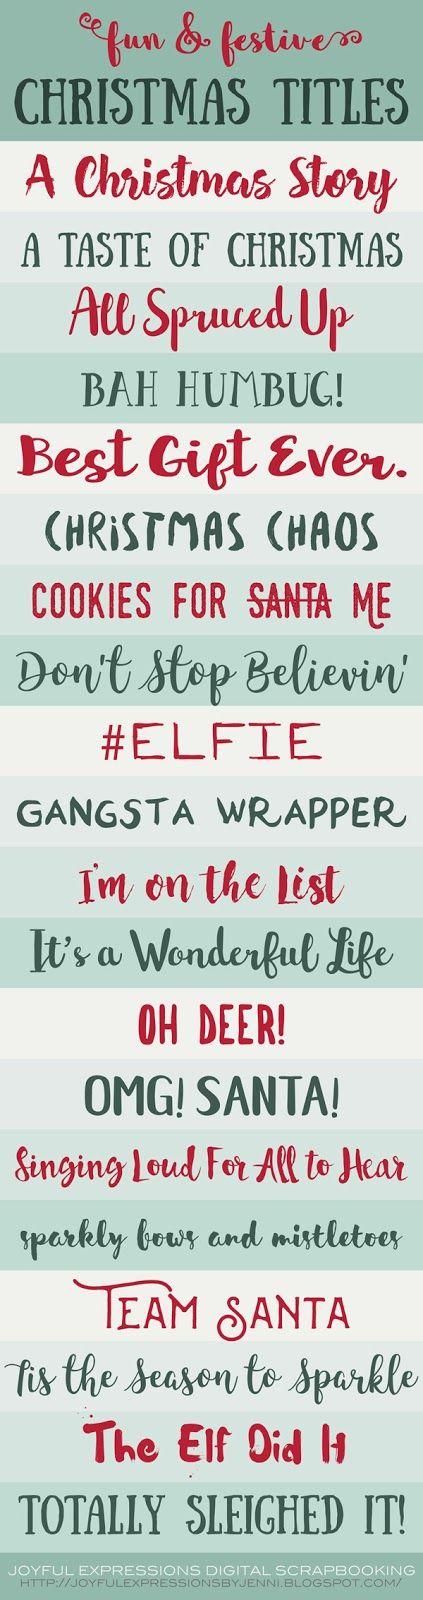 Joyful Expressions : 20 Fun & Festive Christmas Scrapbooking Page Title...